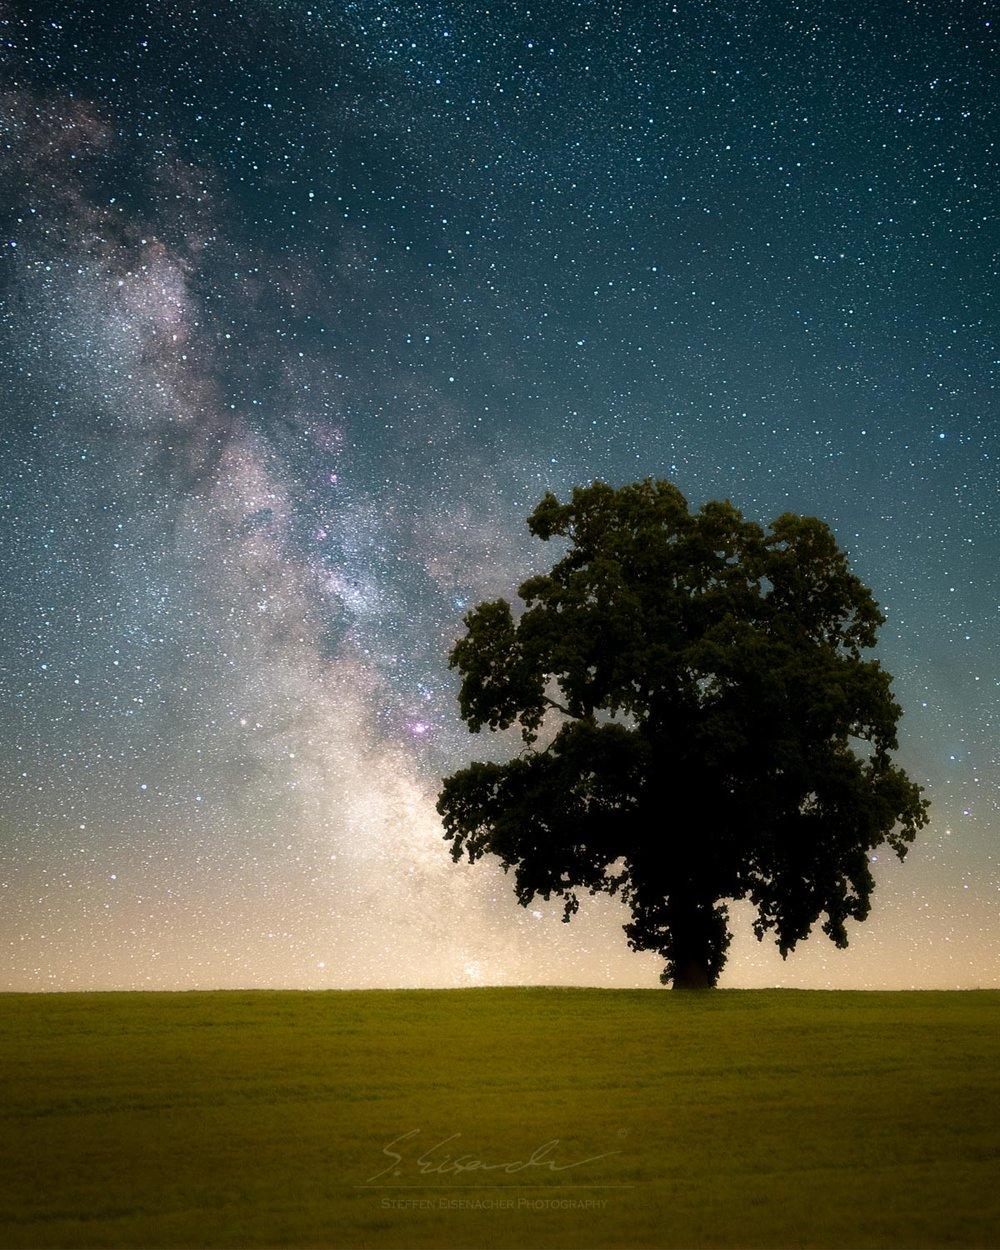 GERMANY_tree compsite-Edit orton.jpg